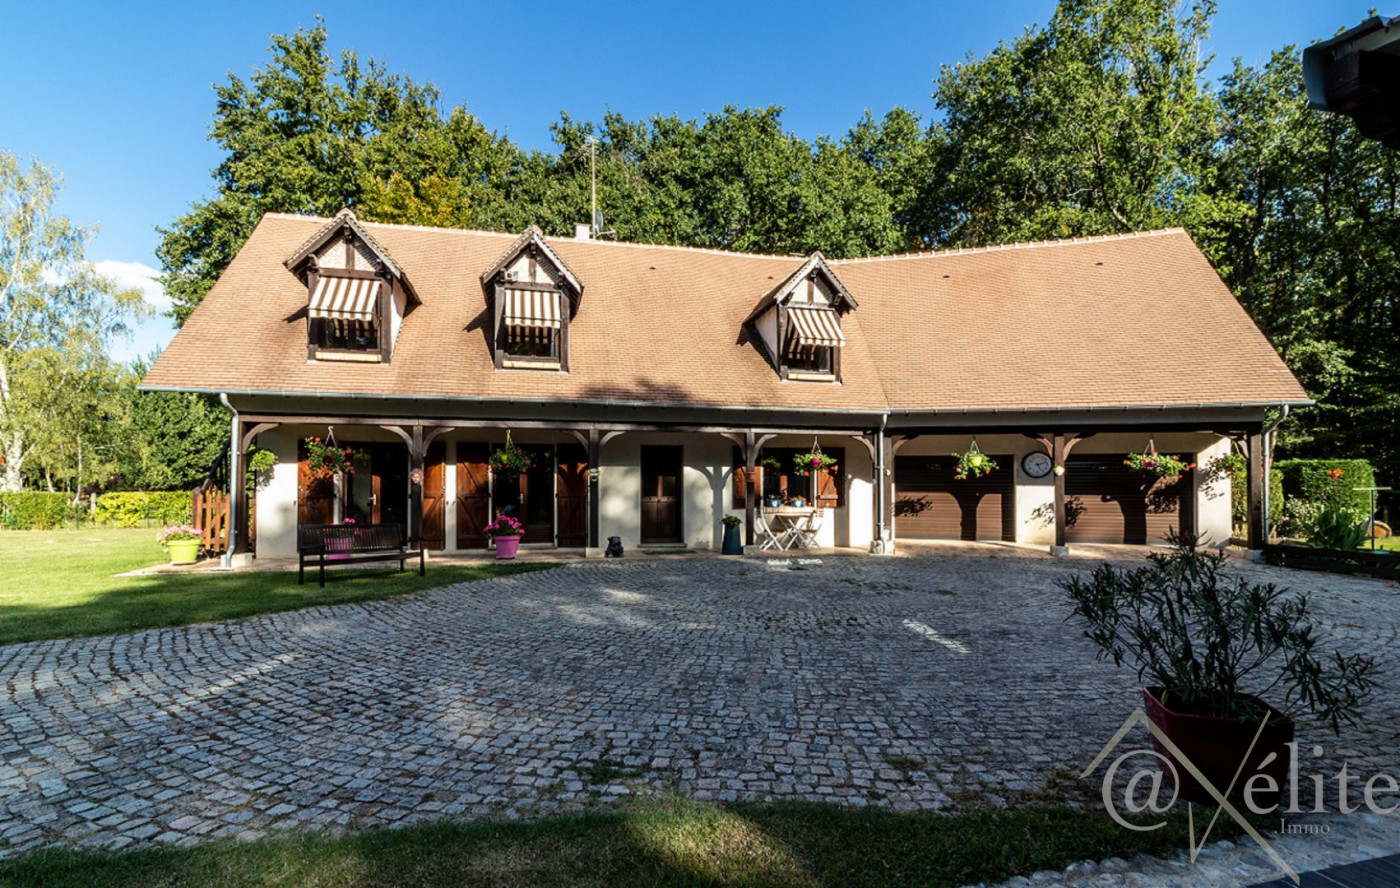 A vendre Vignoux Sur Barangeon 777923159 Axelite sas